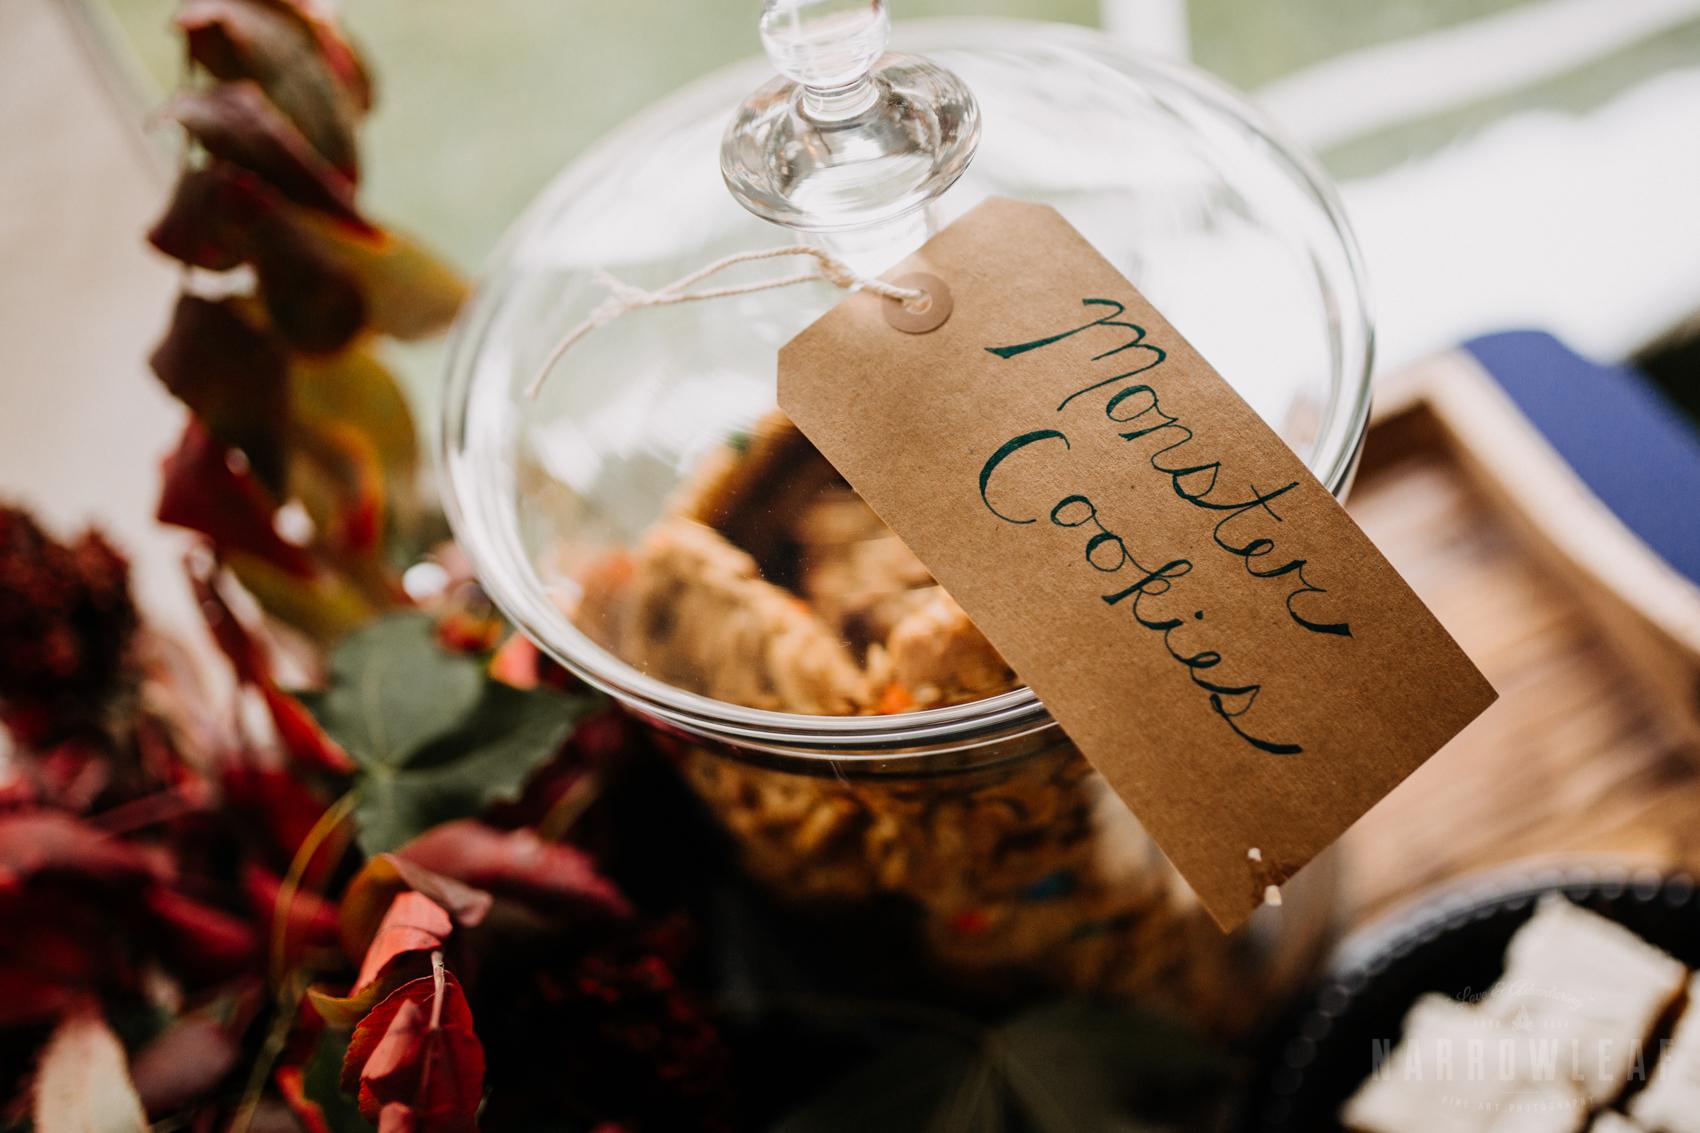 outdoor-tent-wedding-reception-dessert-table-pie--33.jpg